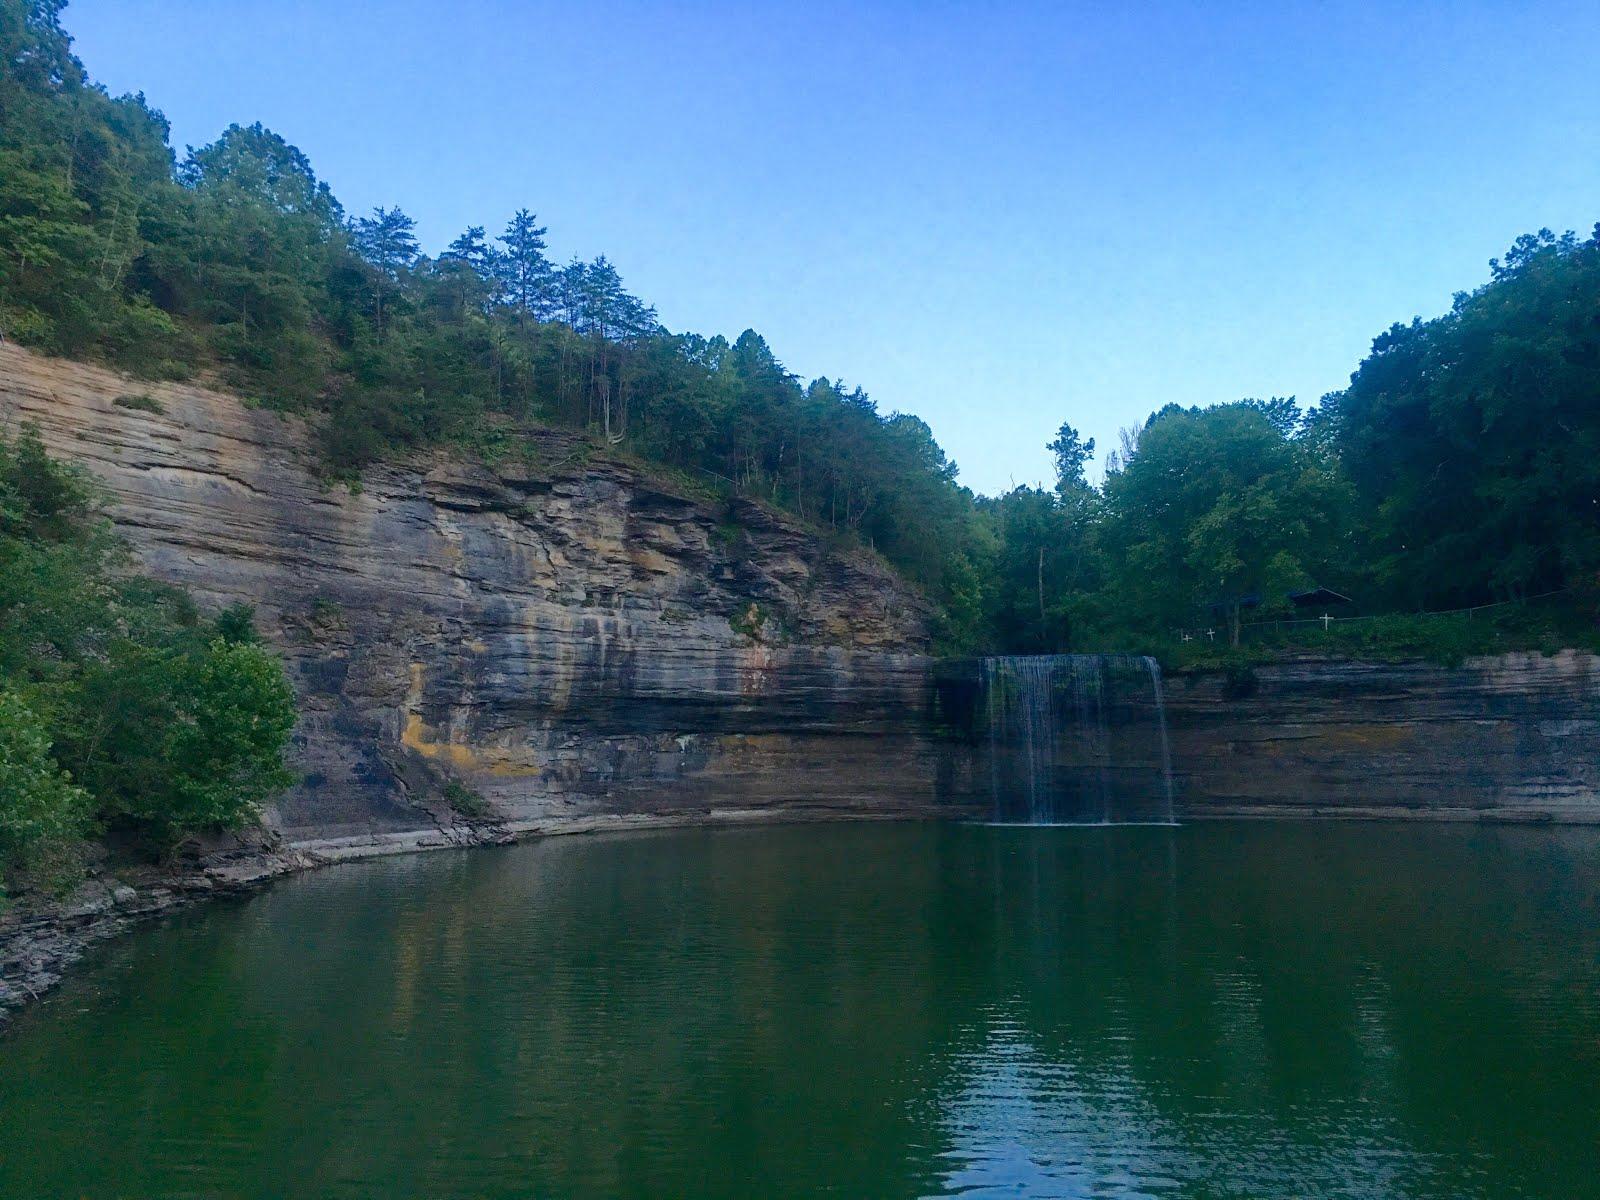 76 Falls In Kentucky Is An Incredibly Beautiful Waterfall